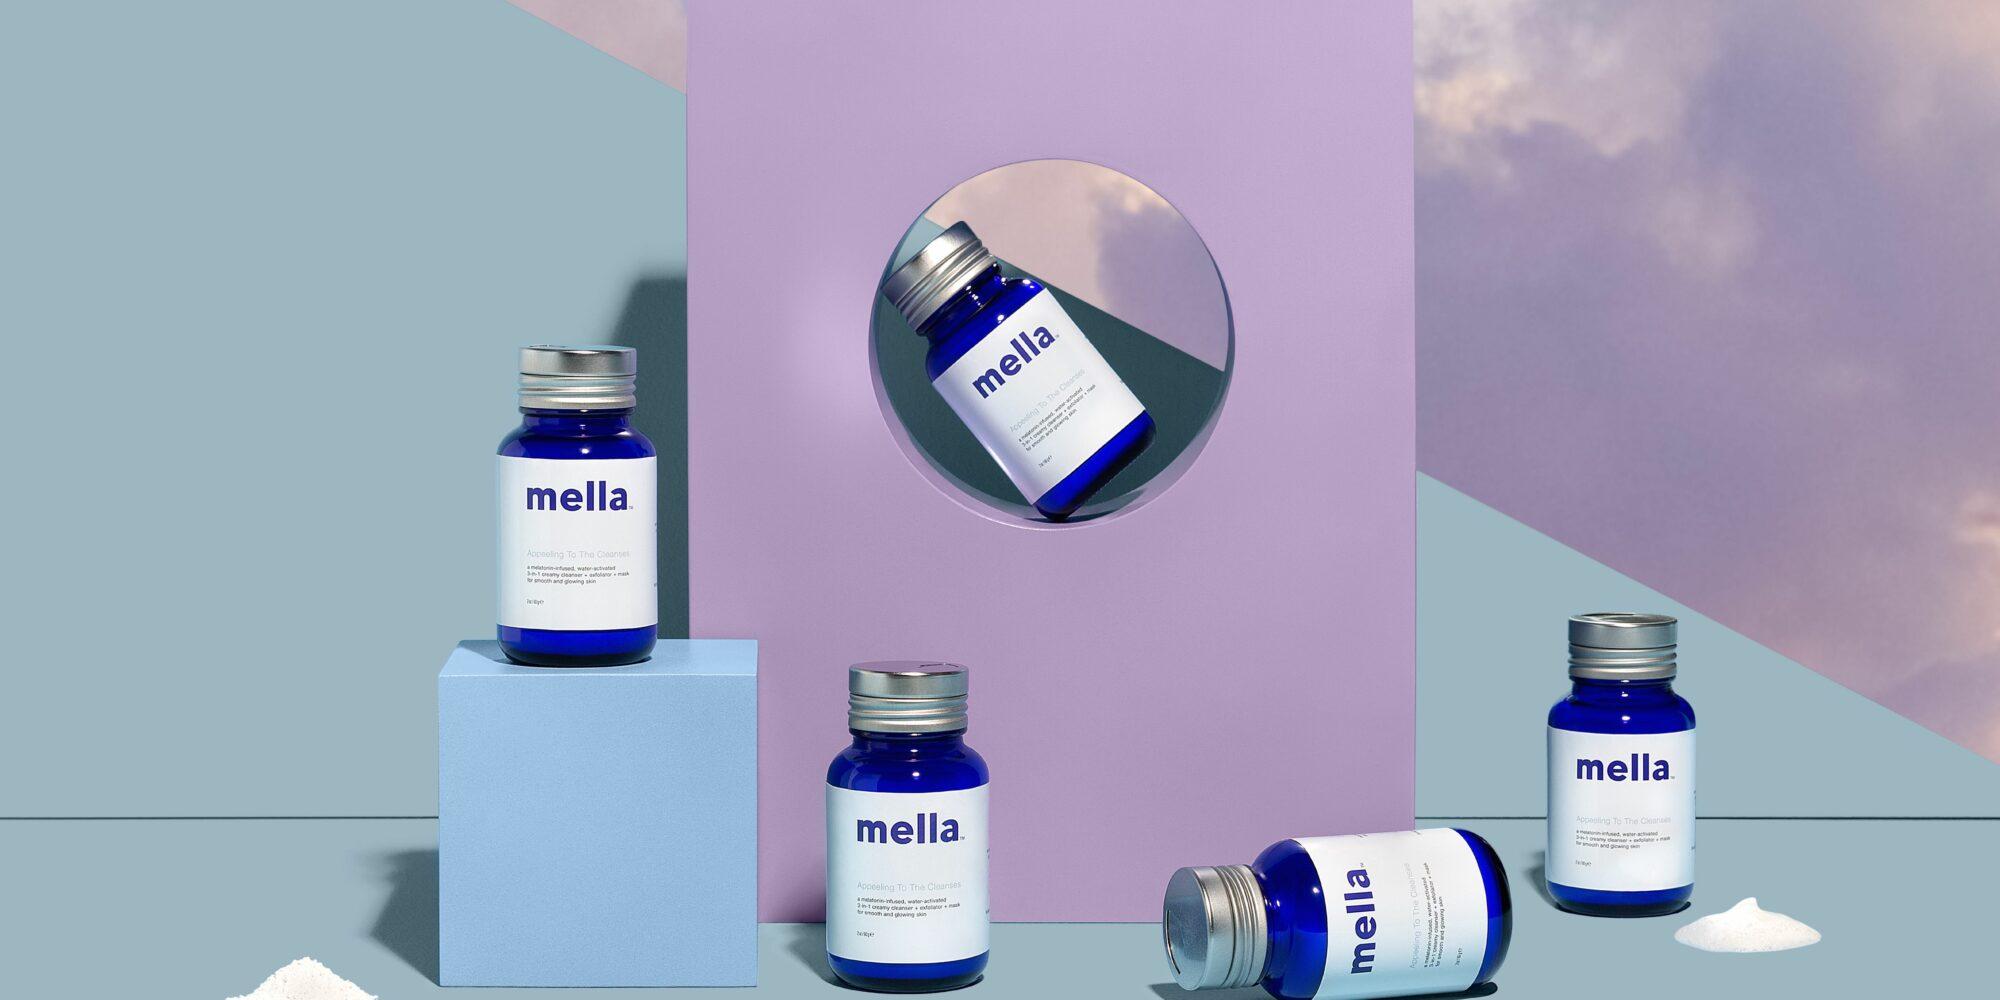 Two Cocokind Alumni Kick Off Sustainable Brand Engine Veriant With Melatonin-Driven Mella